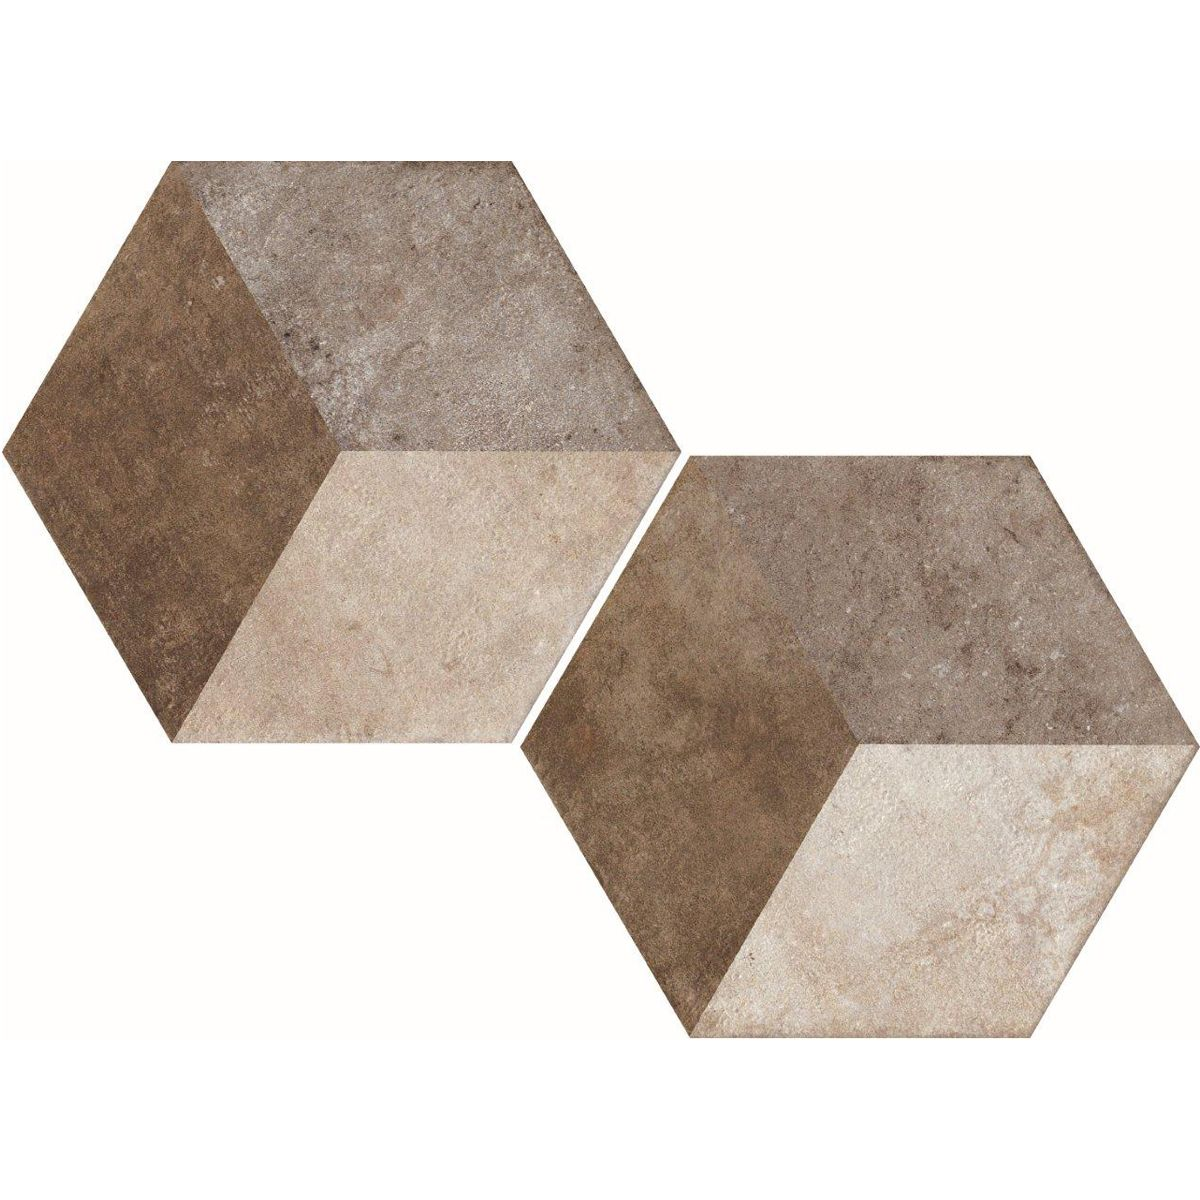 Ivory vintage inspired hexagonal cube patterned tile